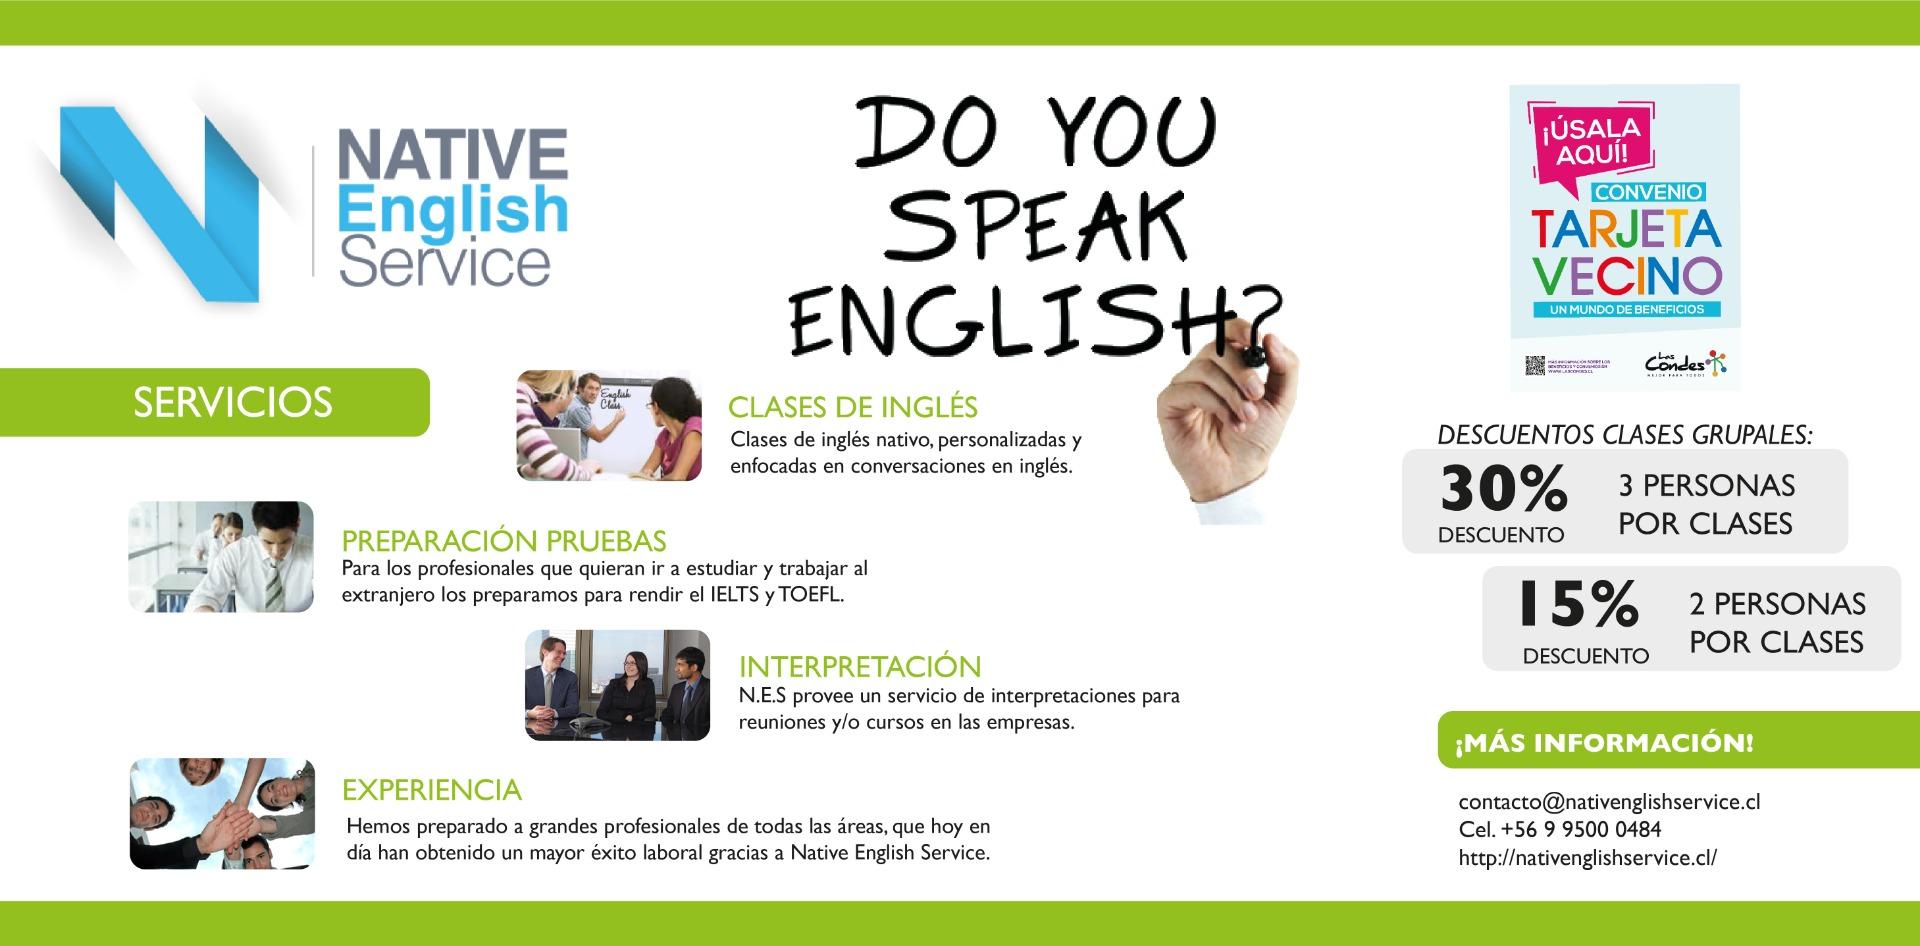 NATIVE ENGLISH SERVICE PROMO